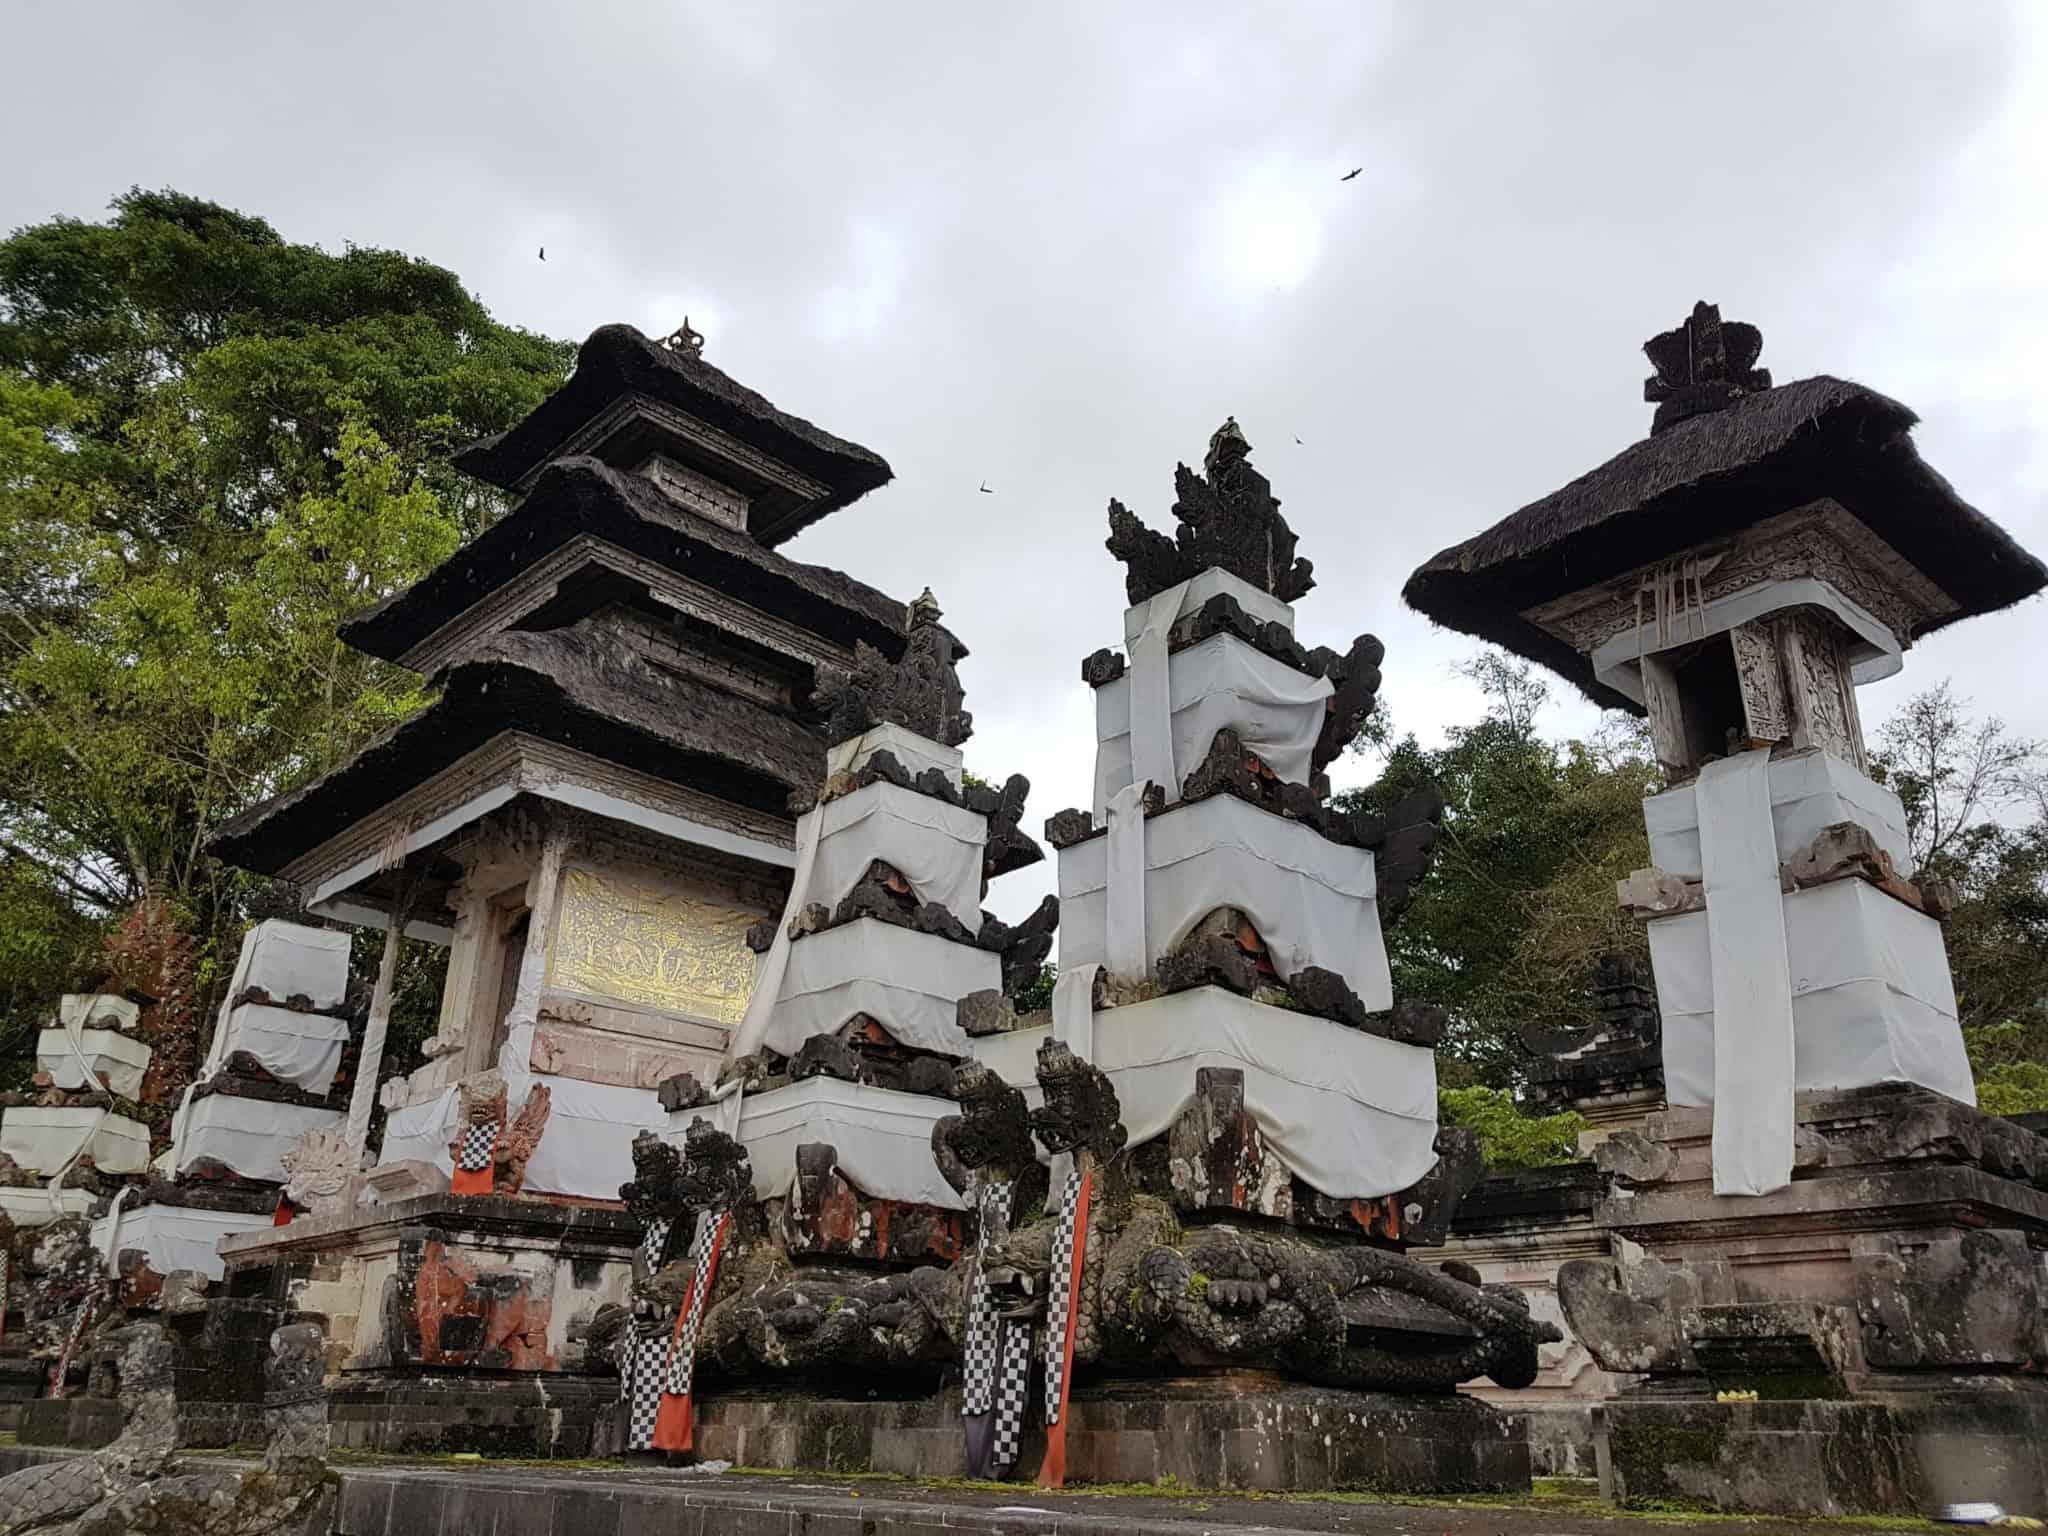 Bali, l'incroyable vue du temple Pura Lempuyang Luhur 🌋 9